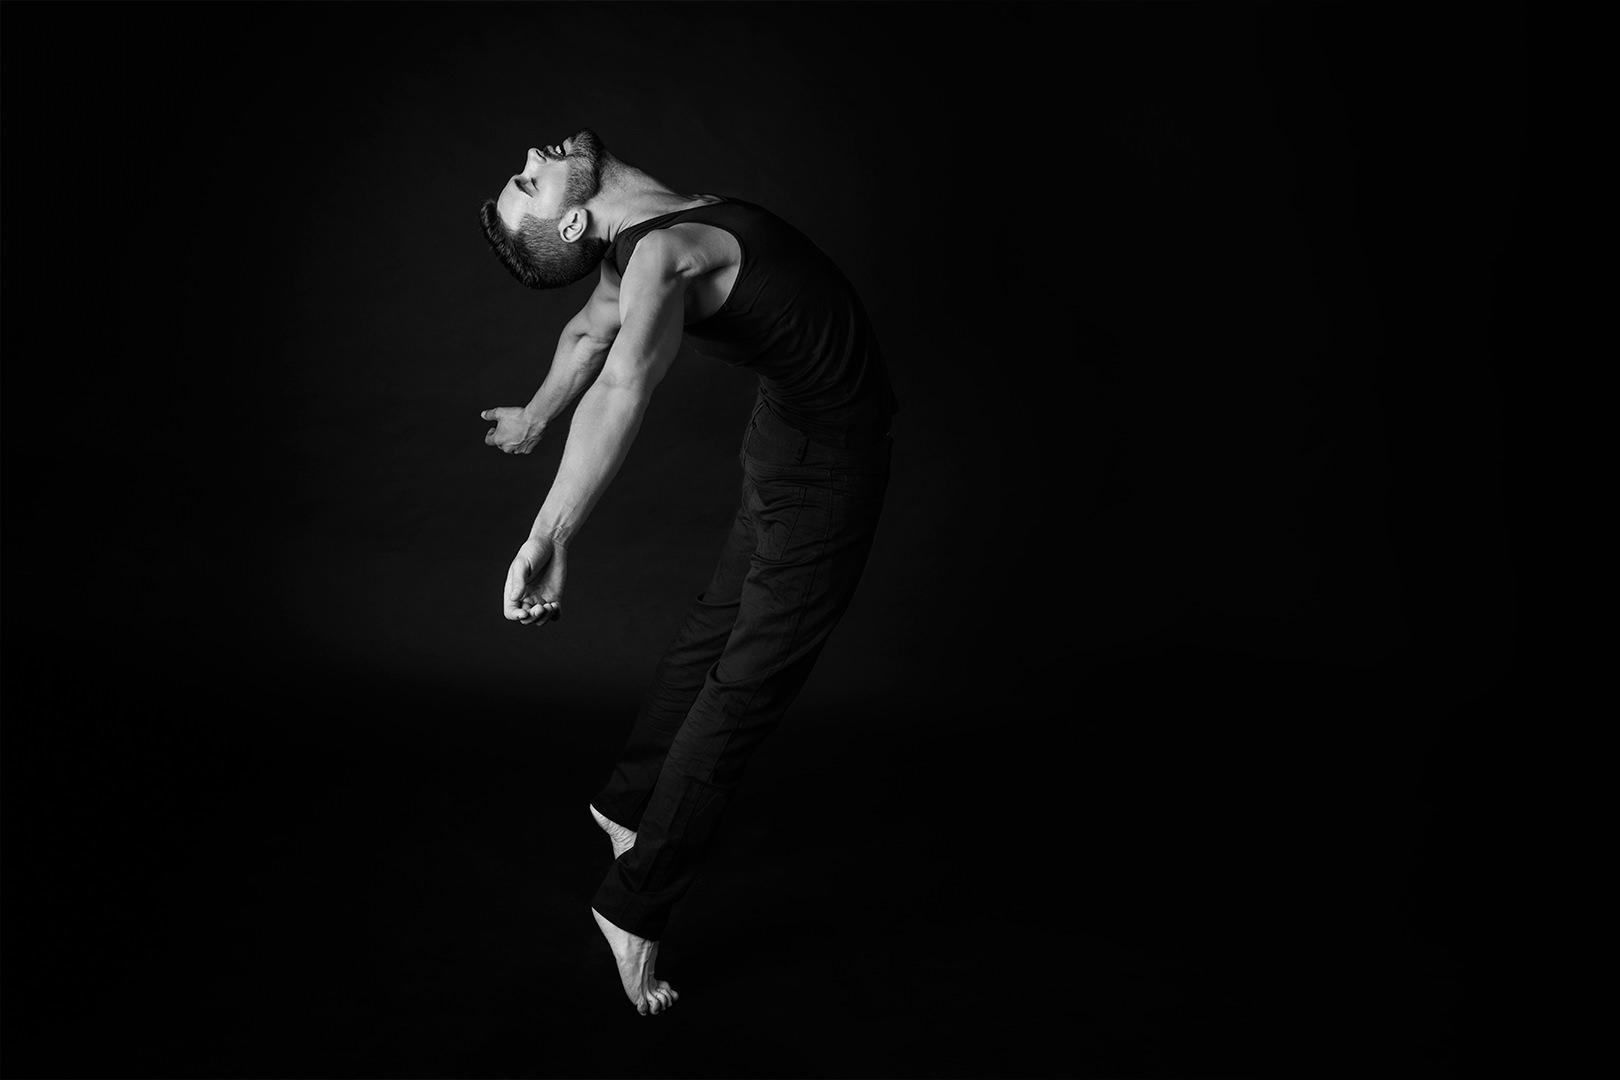 DANZA-Antonio-Ovejero-veinteauno-001 Proyecto DANZA por Antonio Ovejero Proyectos Retratos